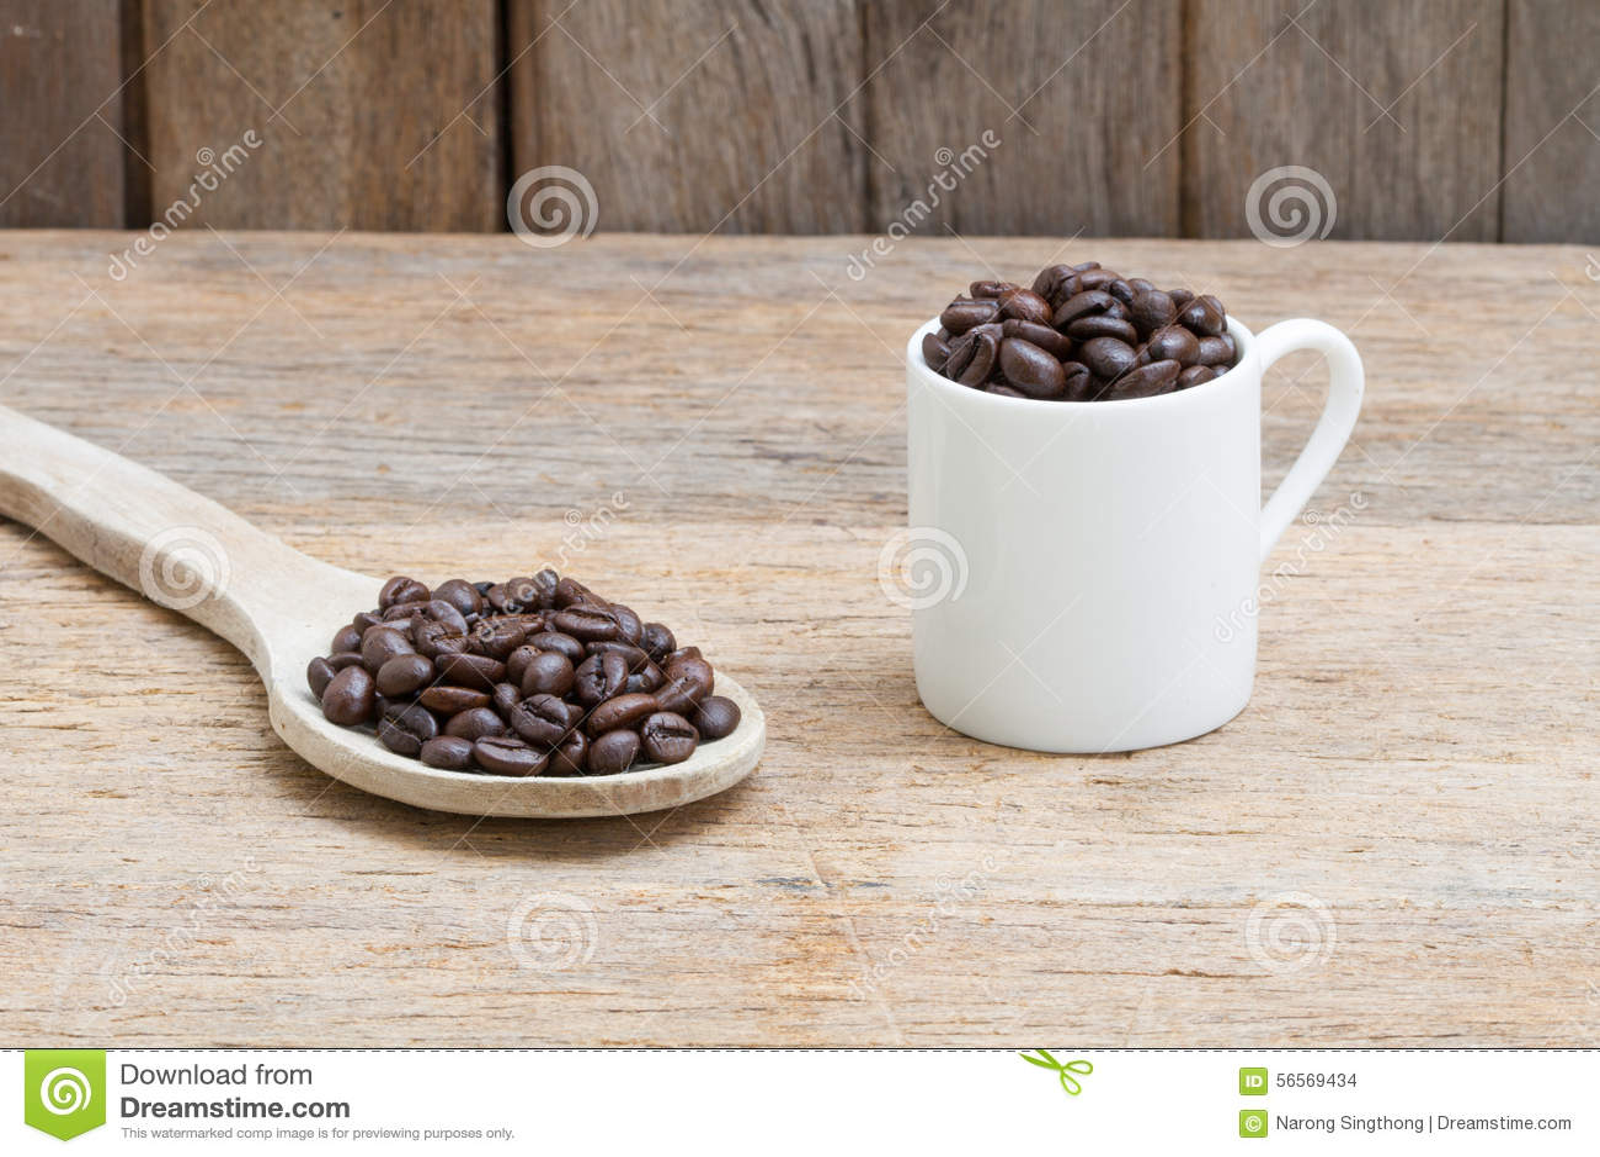 Download στενός καφές φασολιών που αυξάνεται Στοκ Εικόνες - εικόνα από τρόφιμα, φλυτζάνι: 56569434